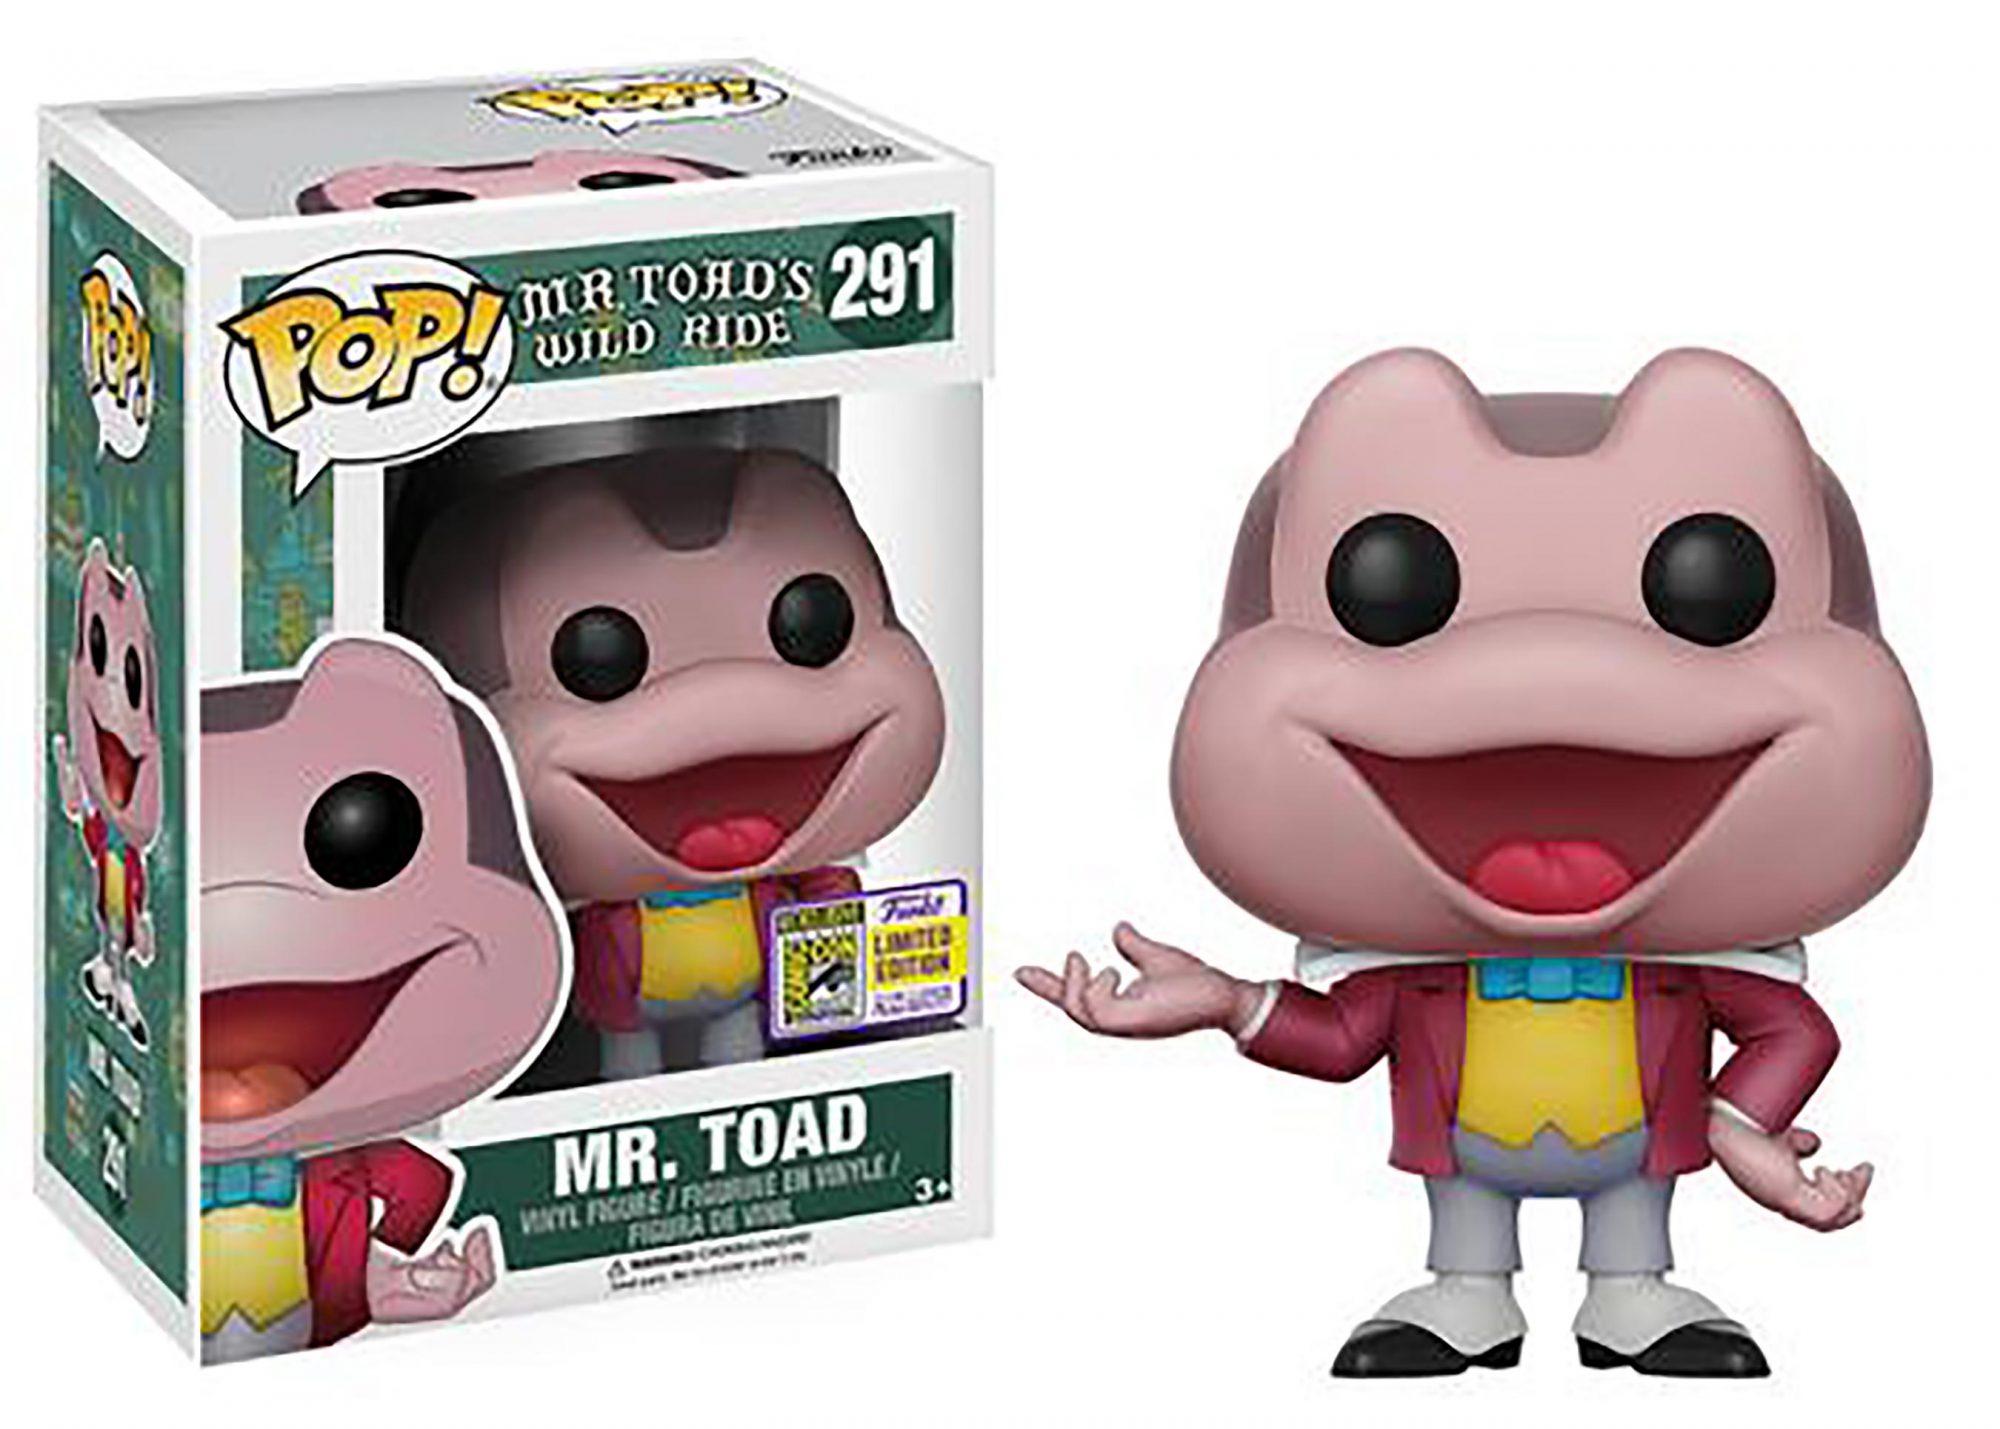 Pop! Disney: Mr. Toad's Wild Ride – Mr. Toad (1500 LE)